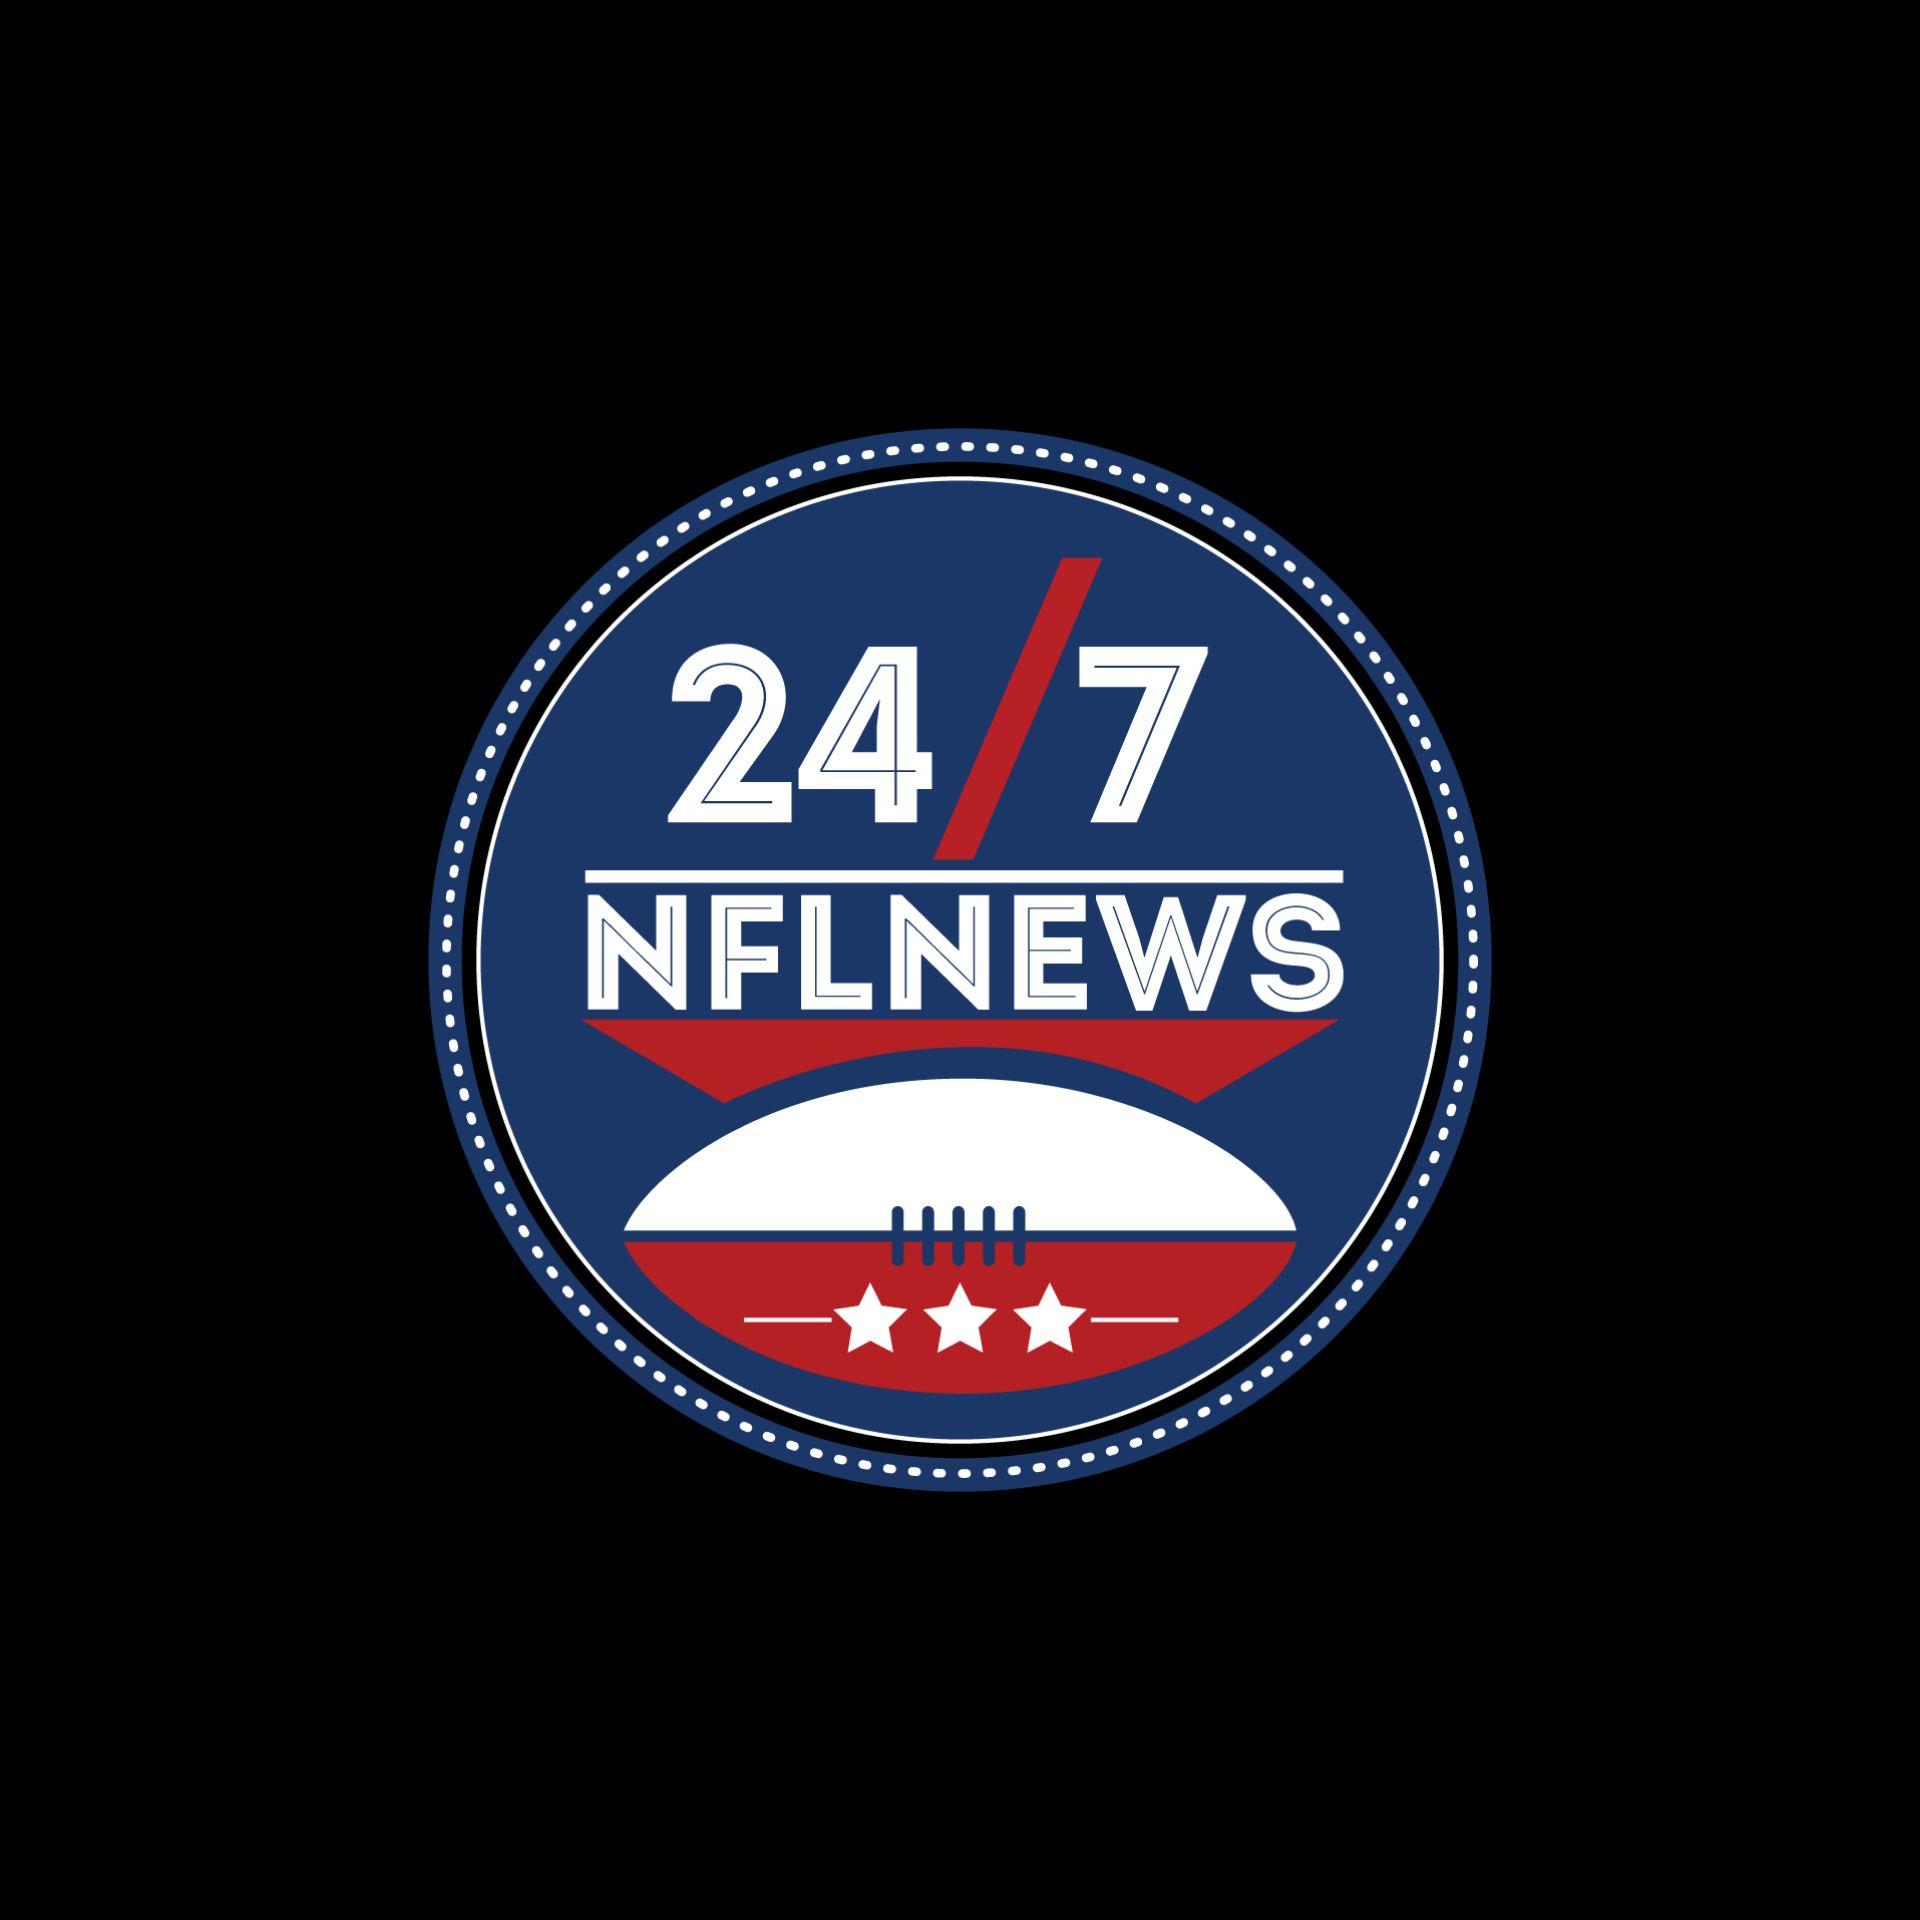 24/7 NFL News